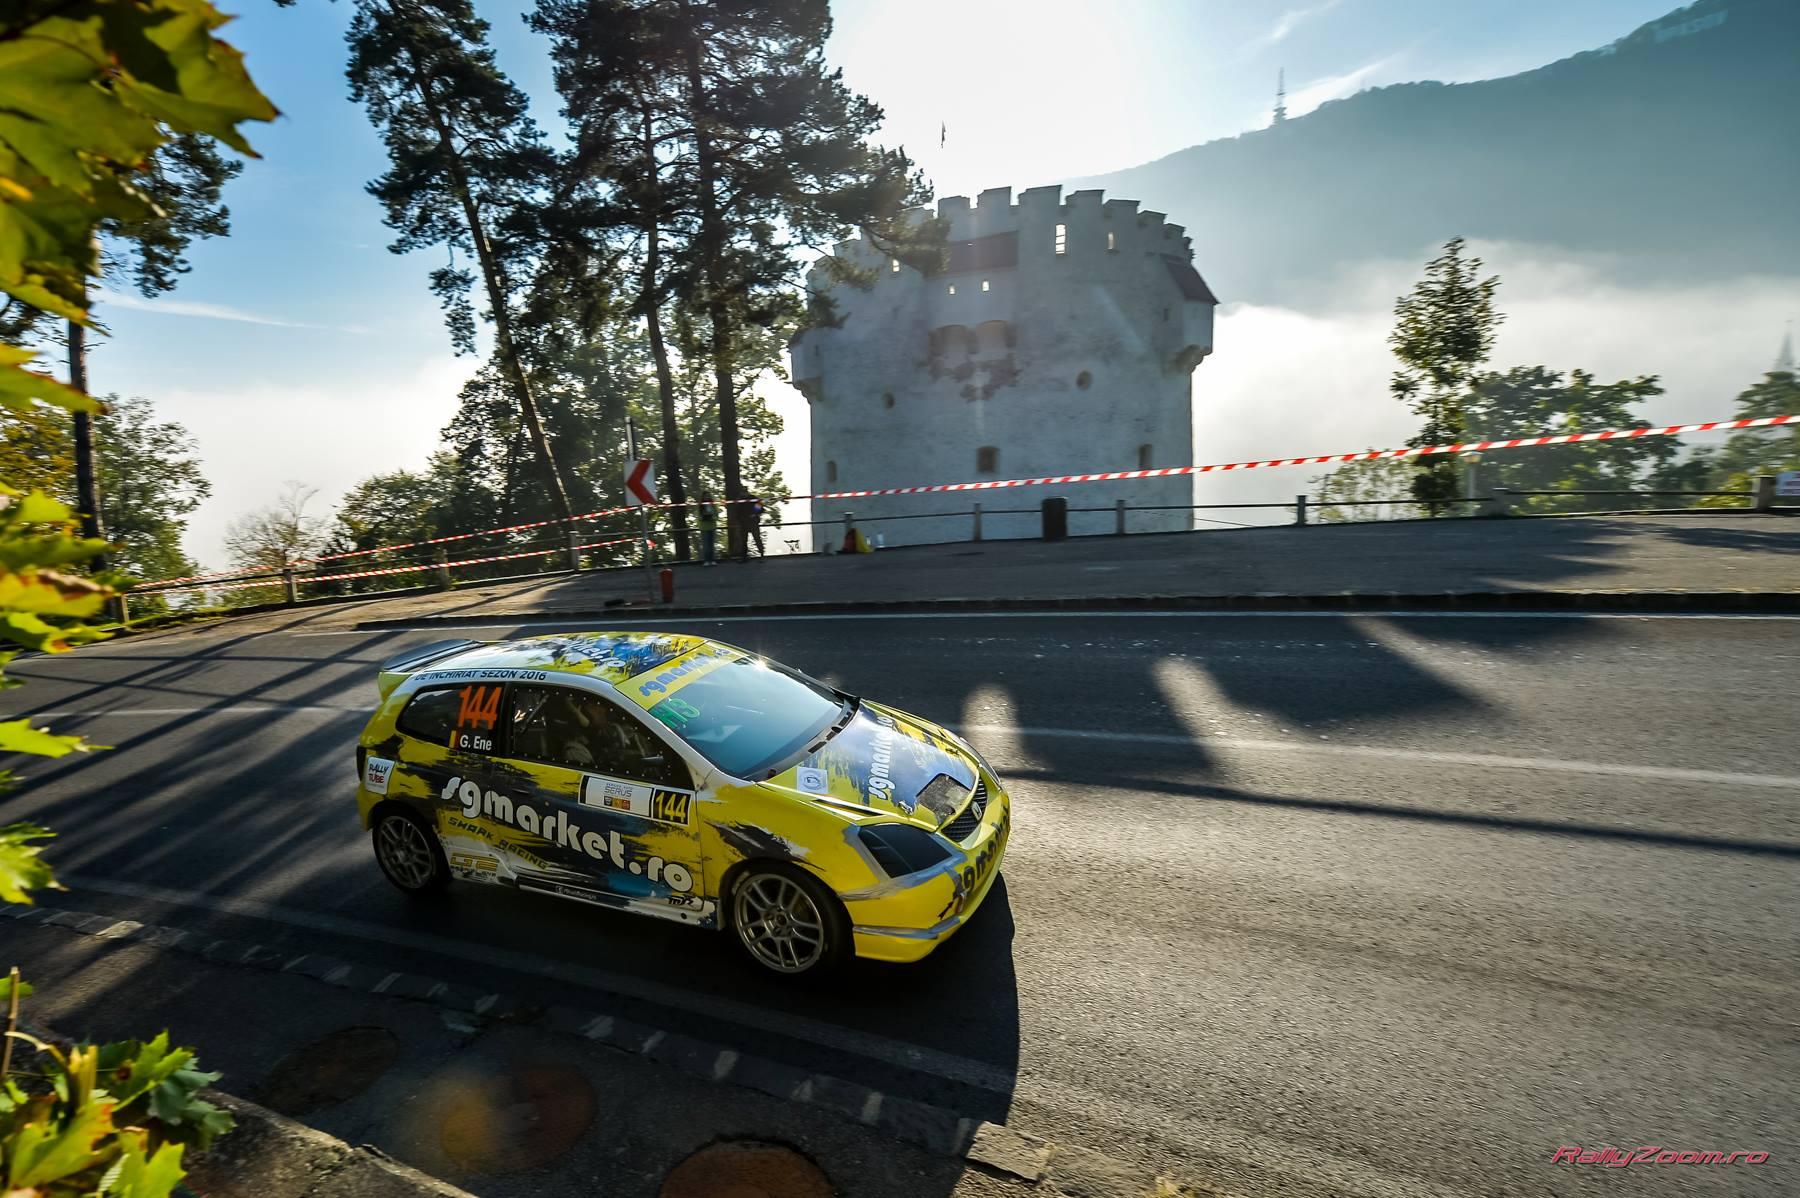 Trofeul Total – Spectacolul automobilistic revine pe Drumul Poienii